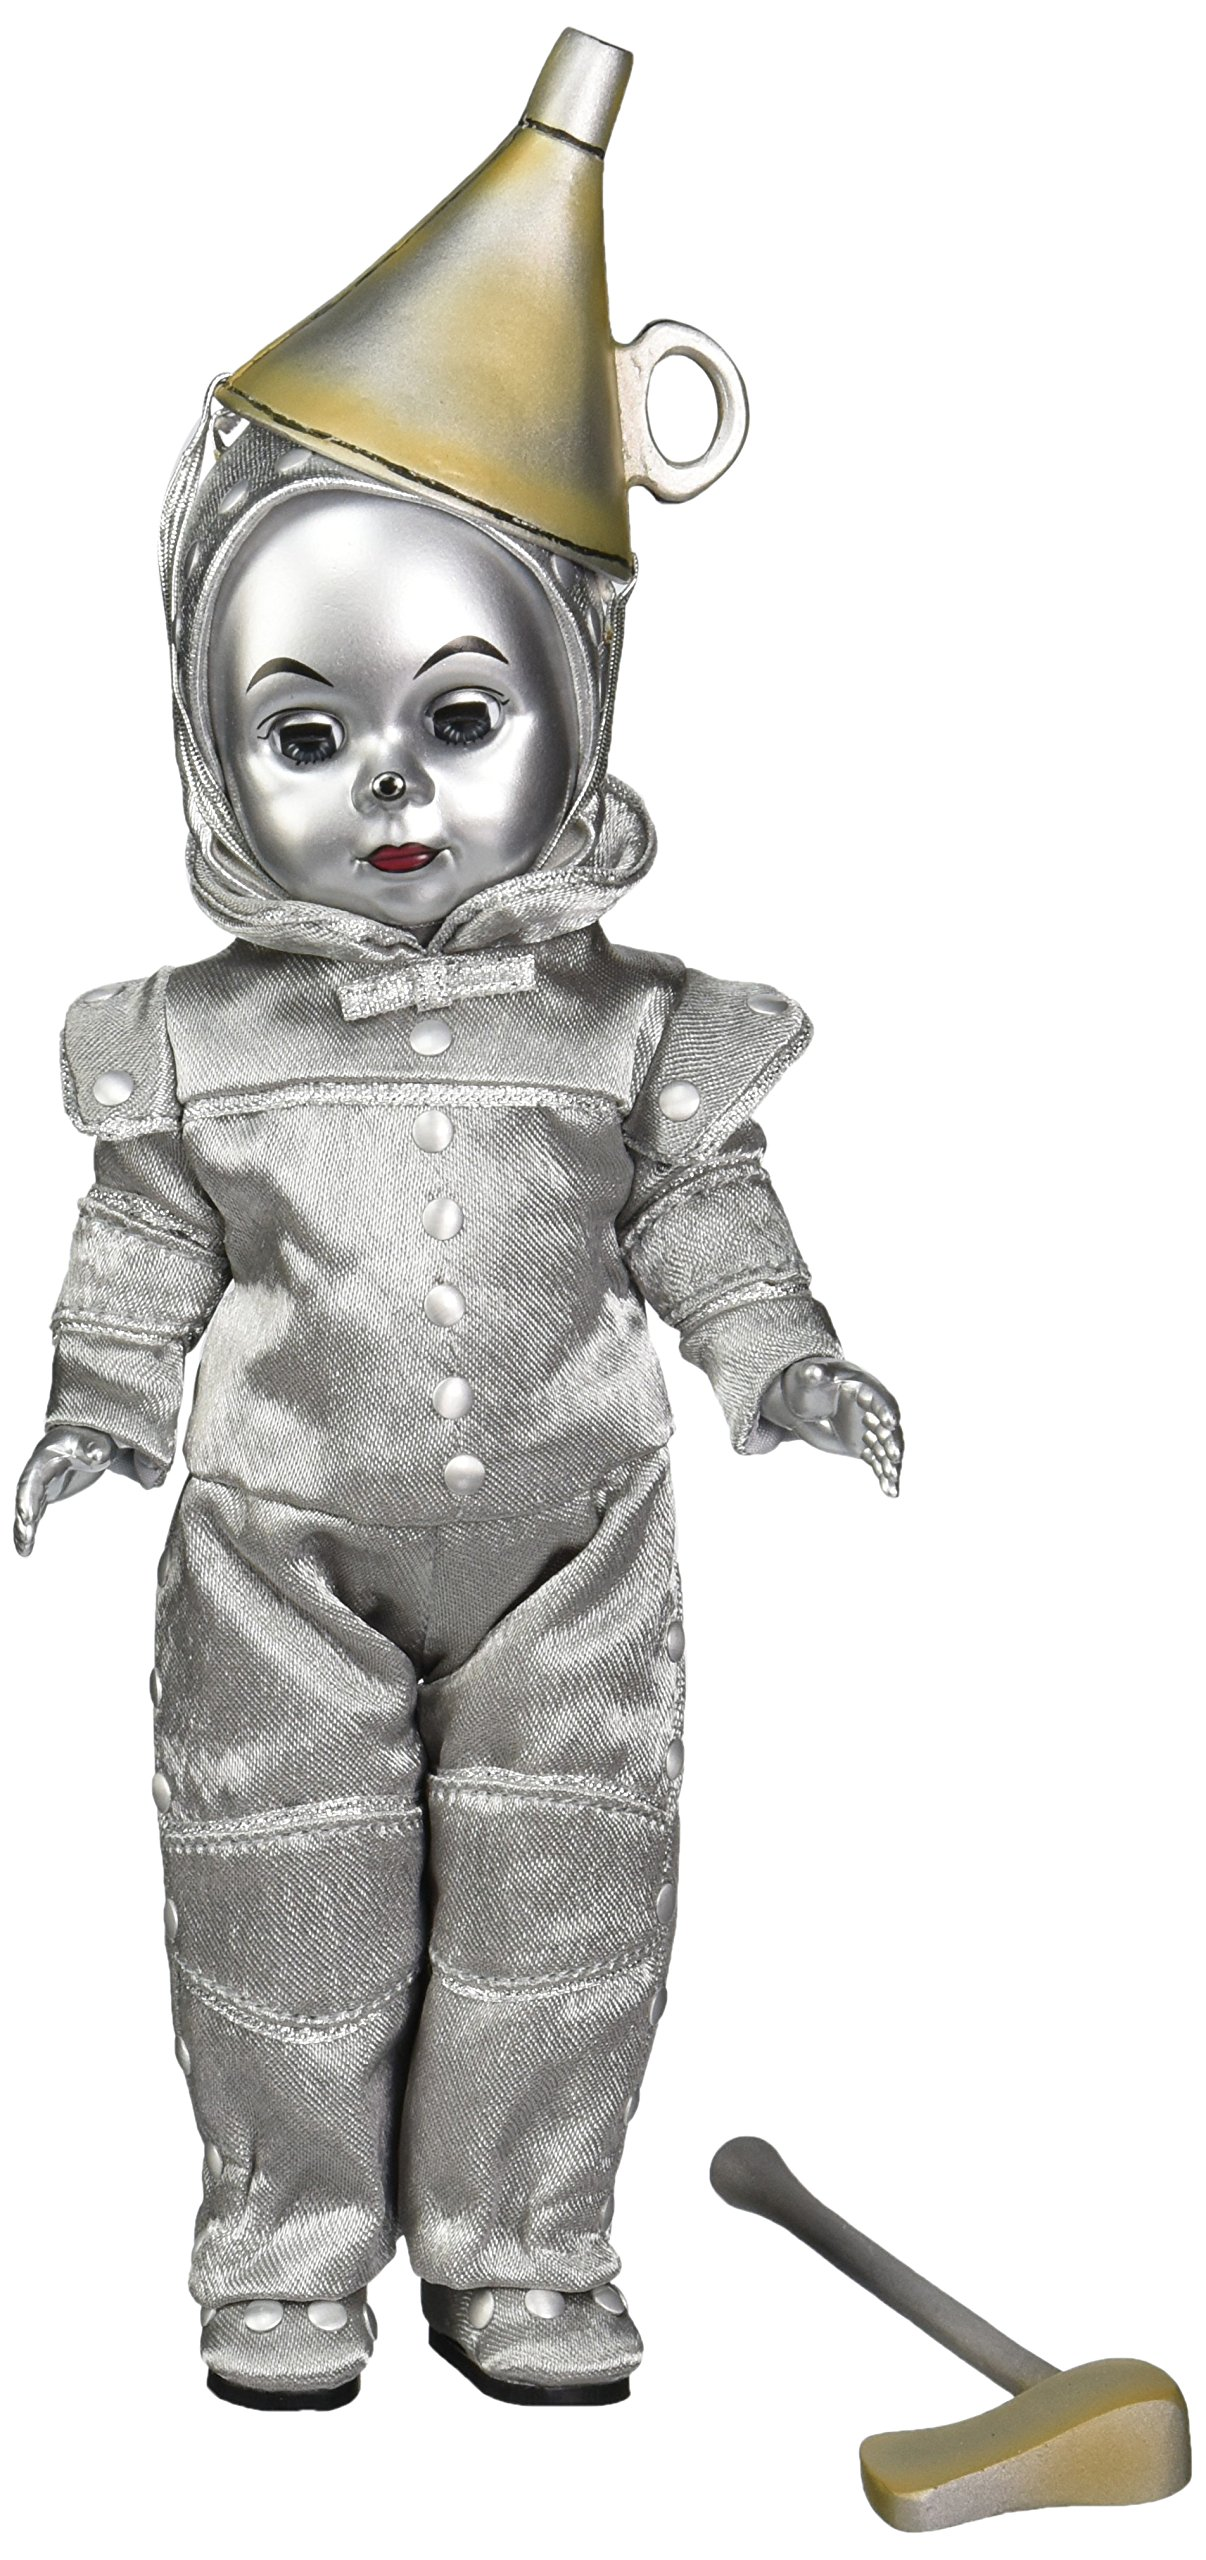 Madame Alexander 8'' New Tin Man, The Wizard of Oz Collection by Madame Alexander